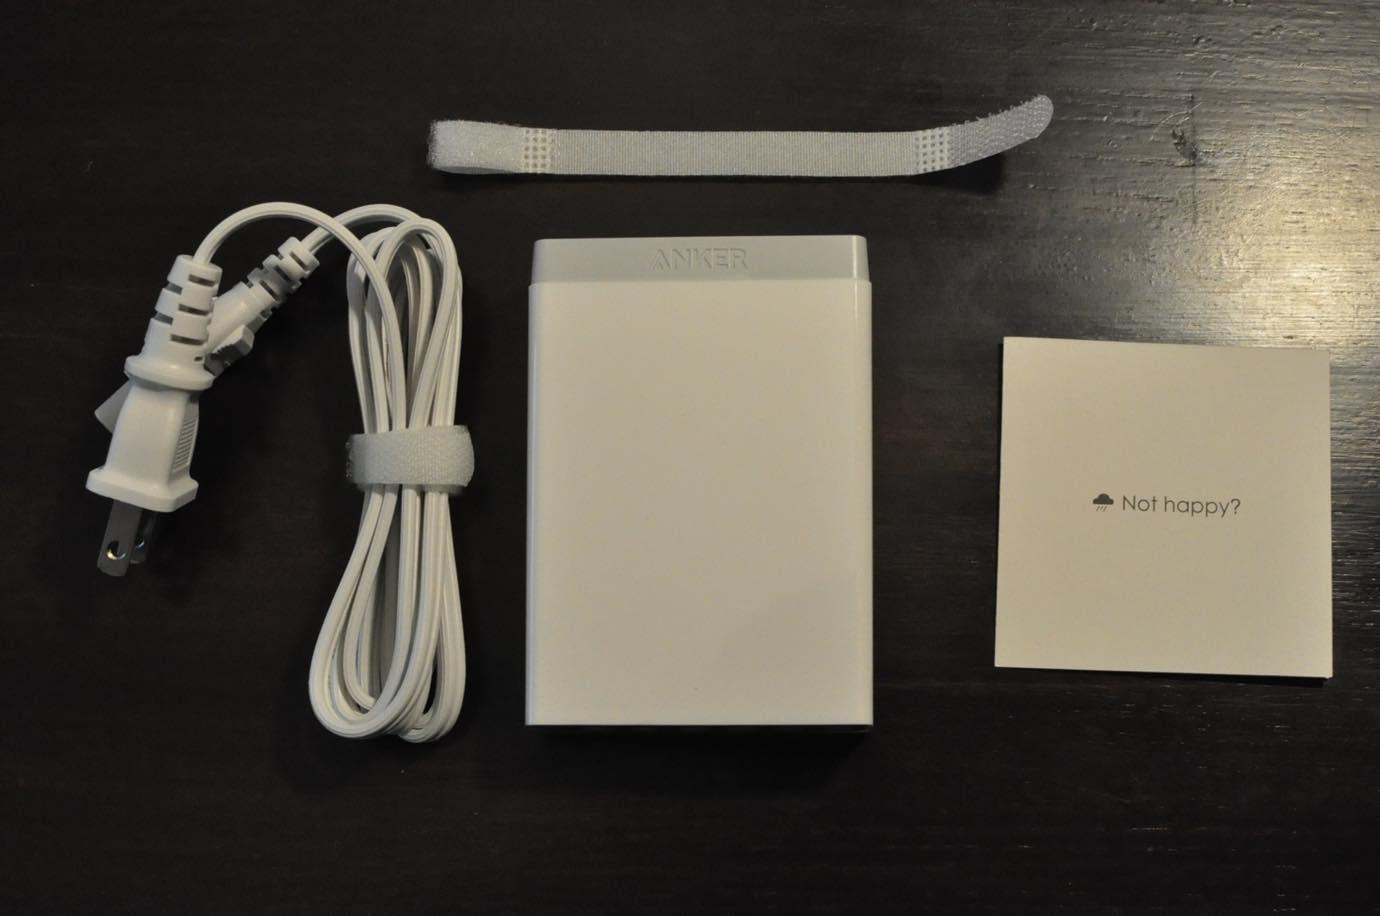 Anker 60W 6ポート USB急速充電器 06 20150808 135911